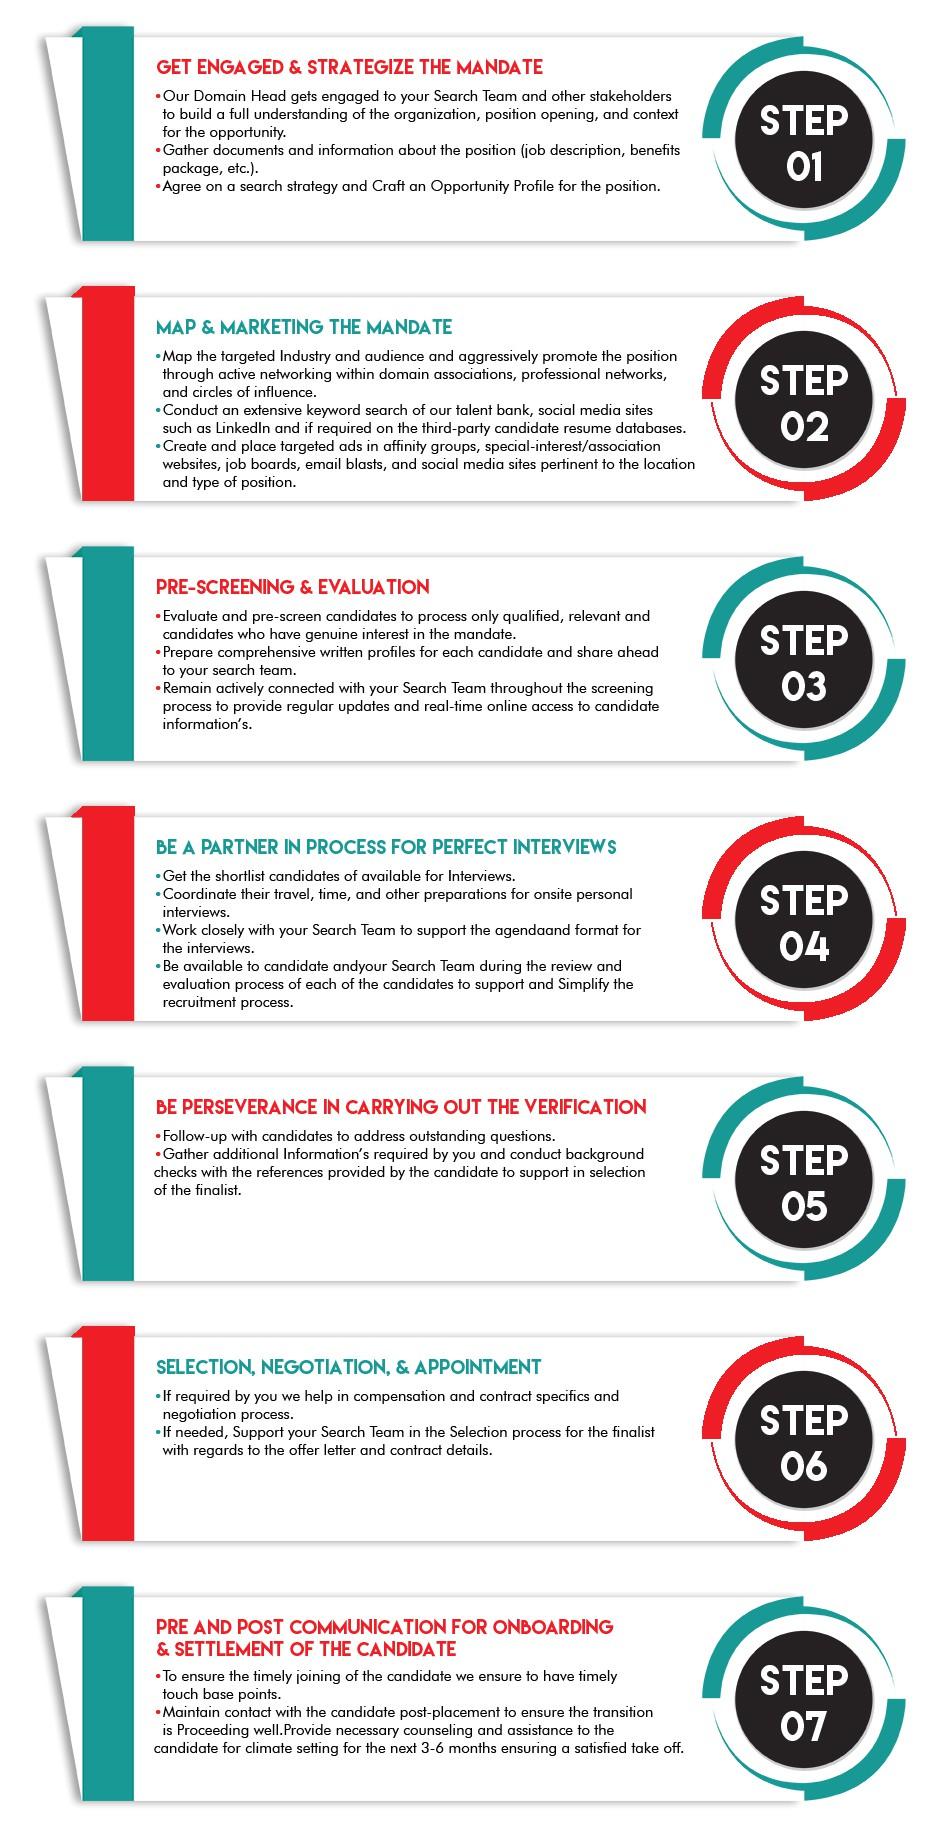 V4 Solutions Methodology